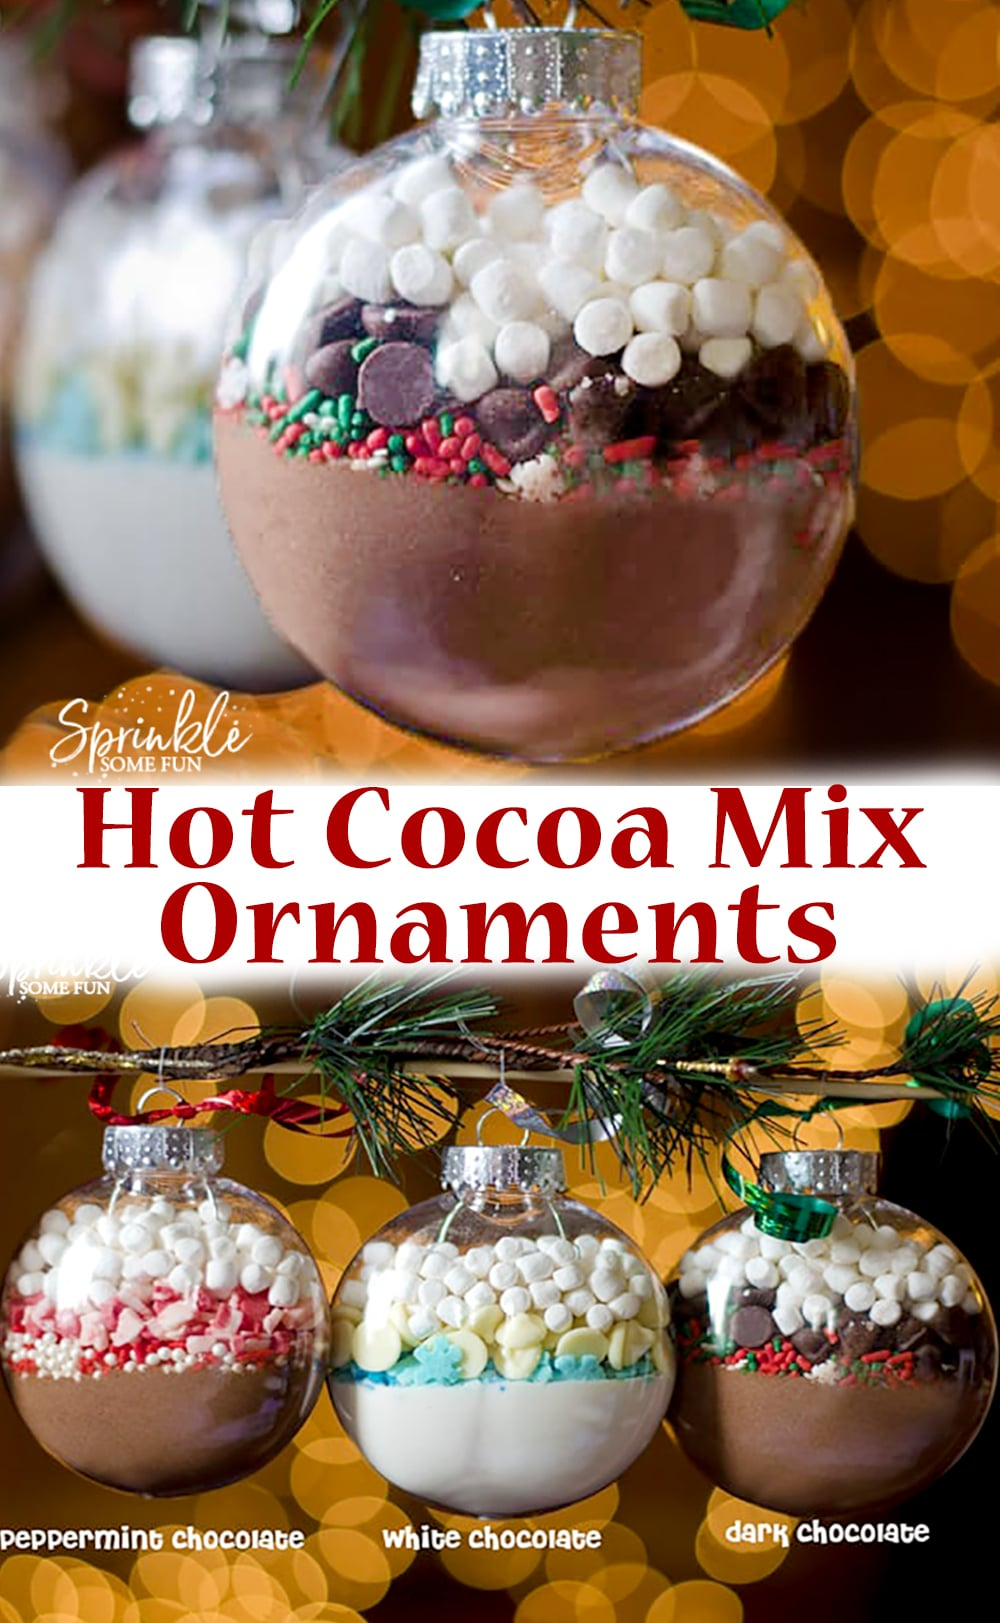 Hot Cocoa Mix Ornaments ~ DIY Homemade Christmas Gift Idea